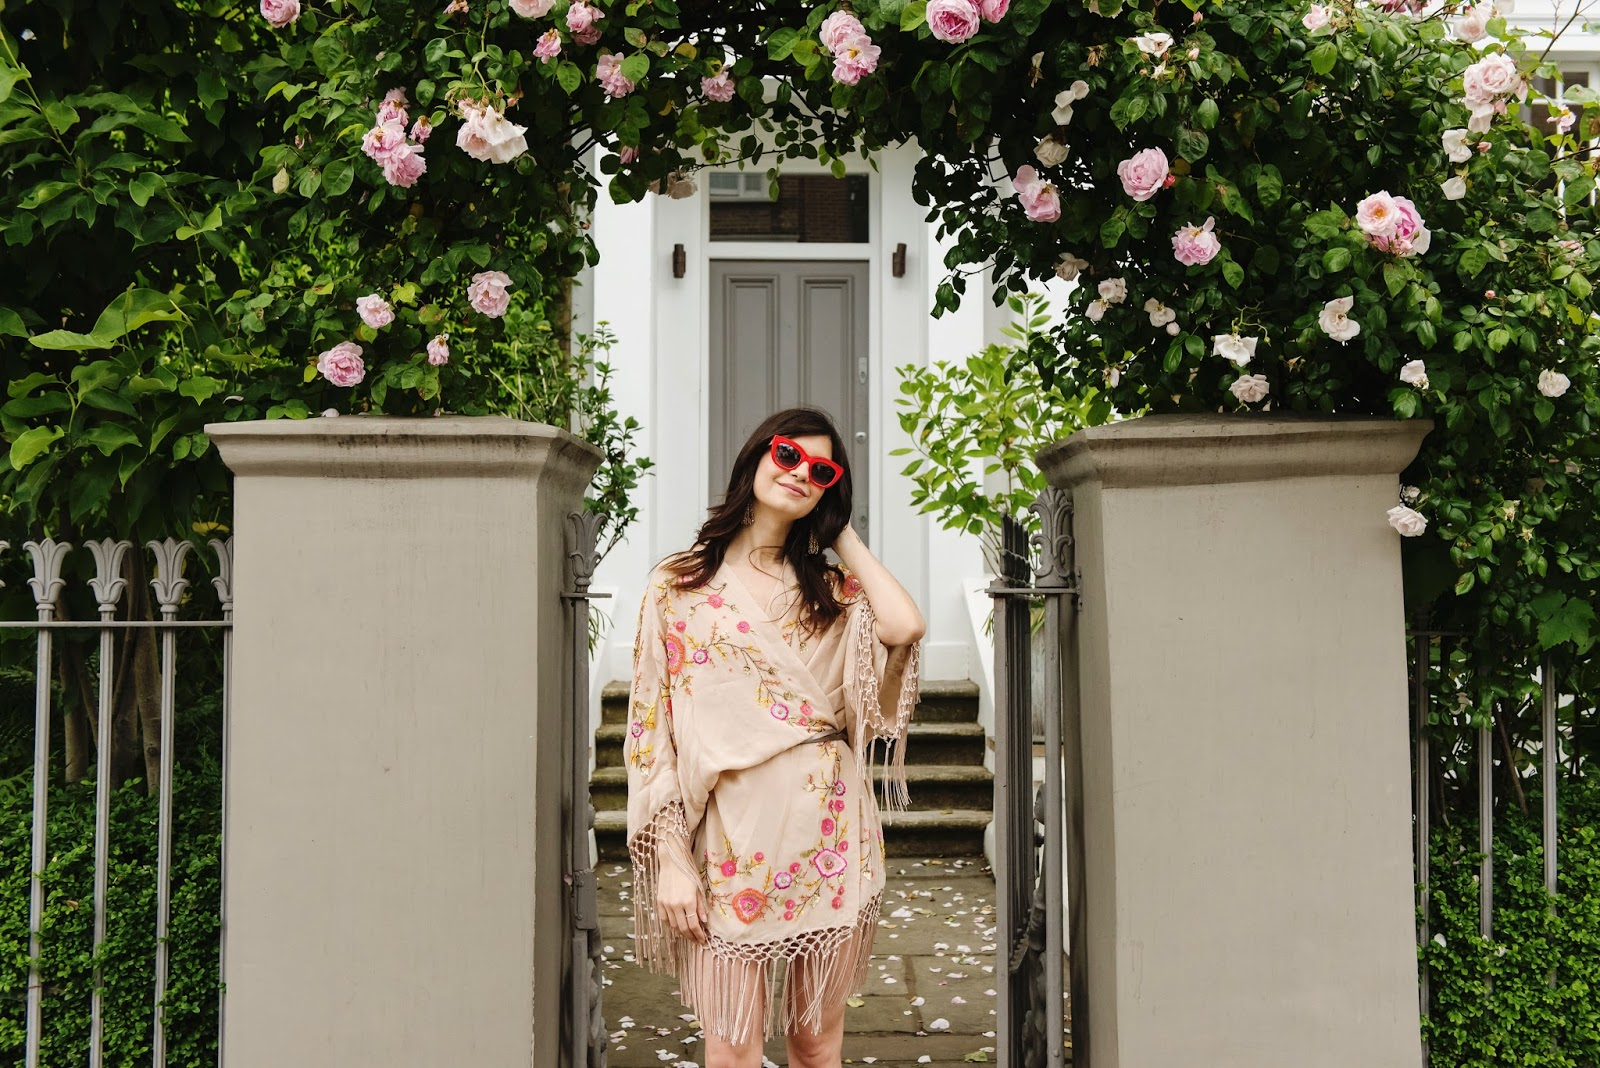 embellished kiono, festival, lace up heels, parisian heels, office shoes, red shades, sunglasses, cateye, cat eye